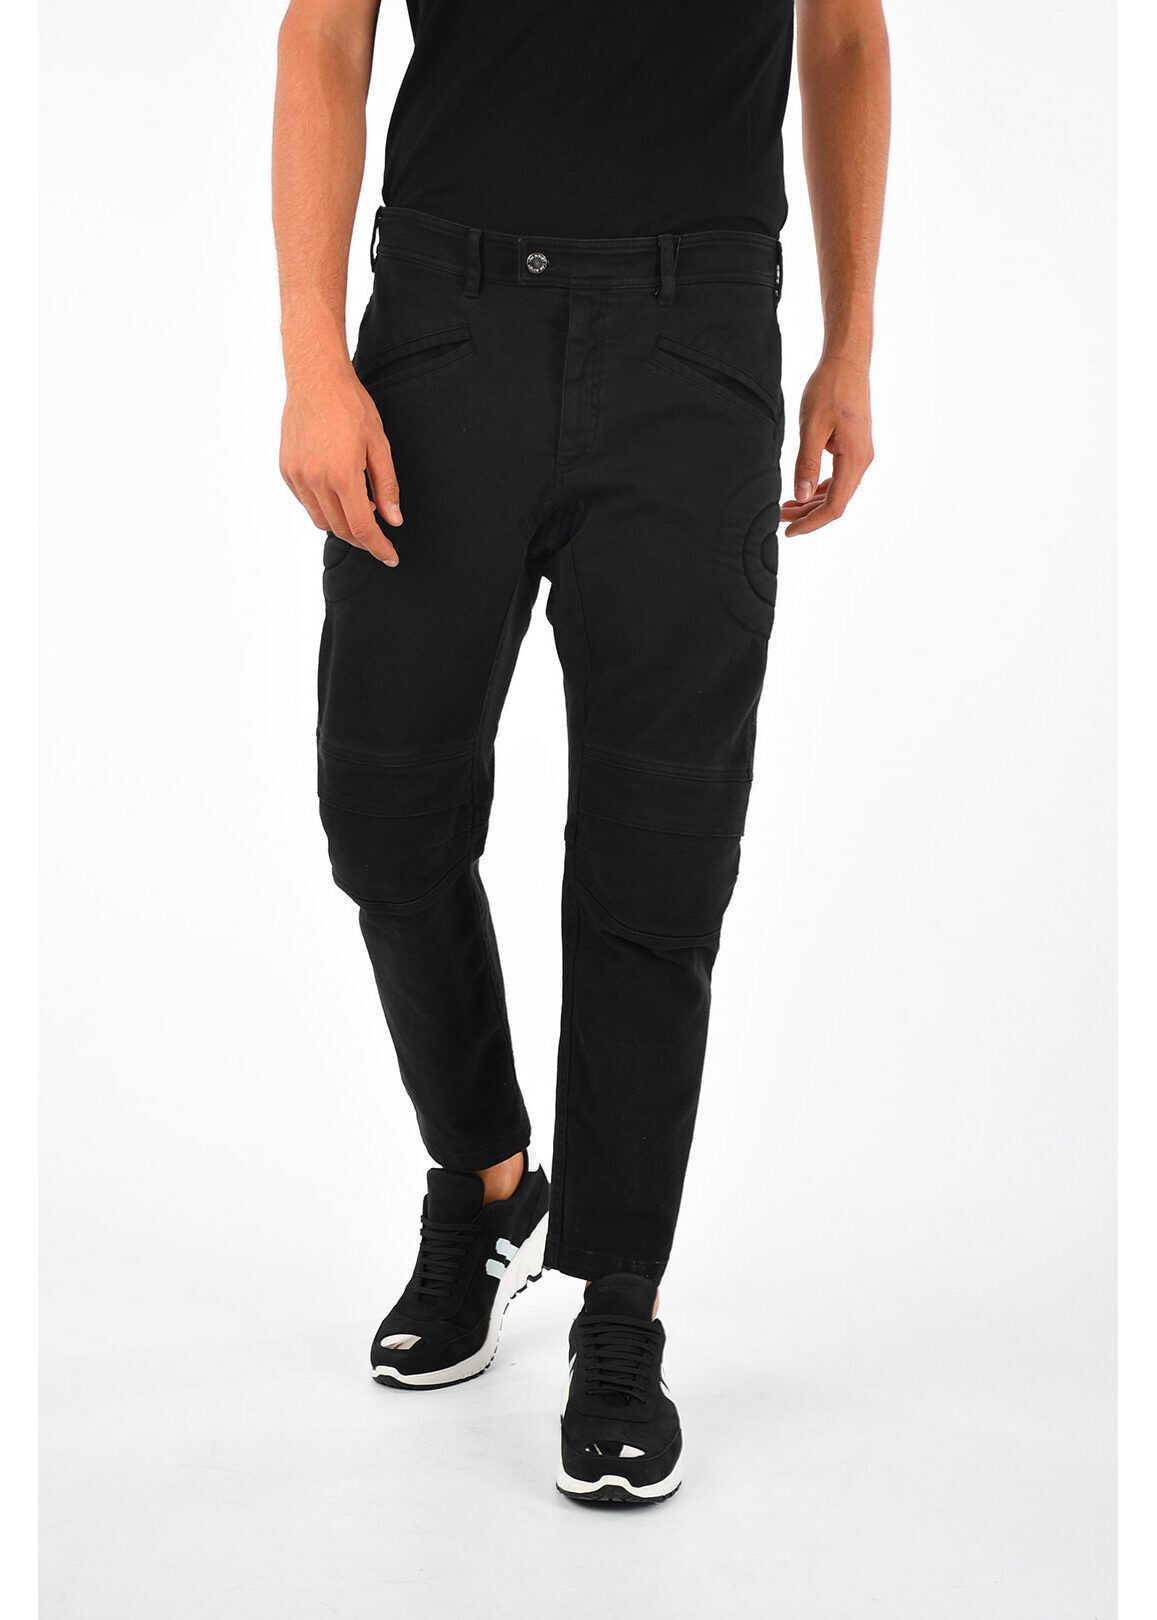 Neil Barrett 17cm Low Rise Biker Jeans BLACK